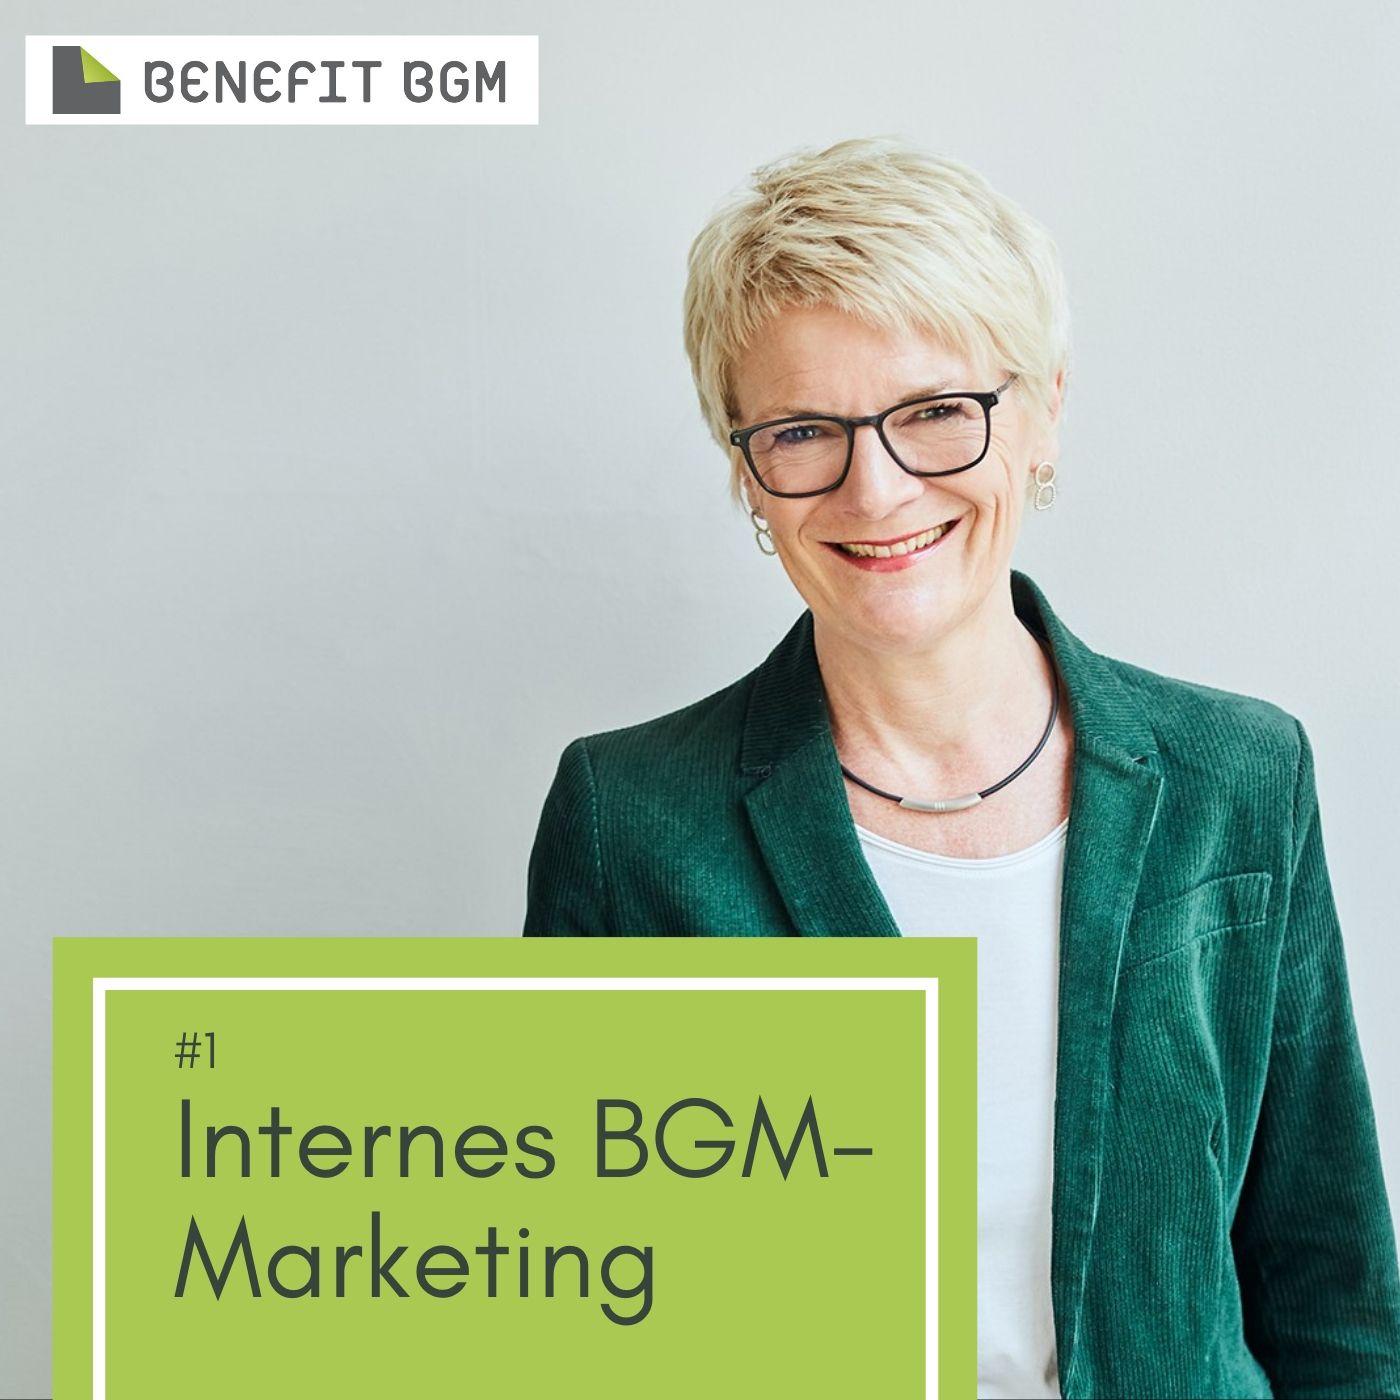 #1 Internes BGM-Marketing